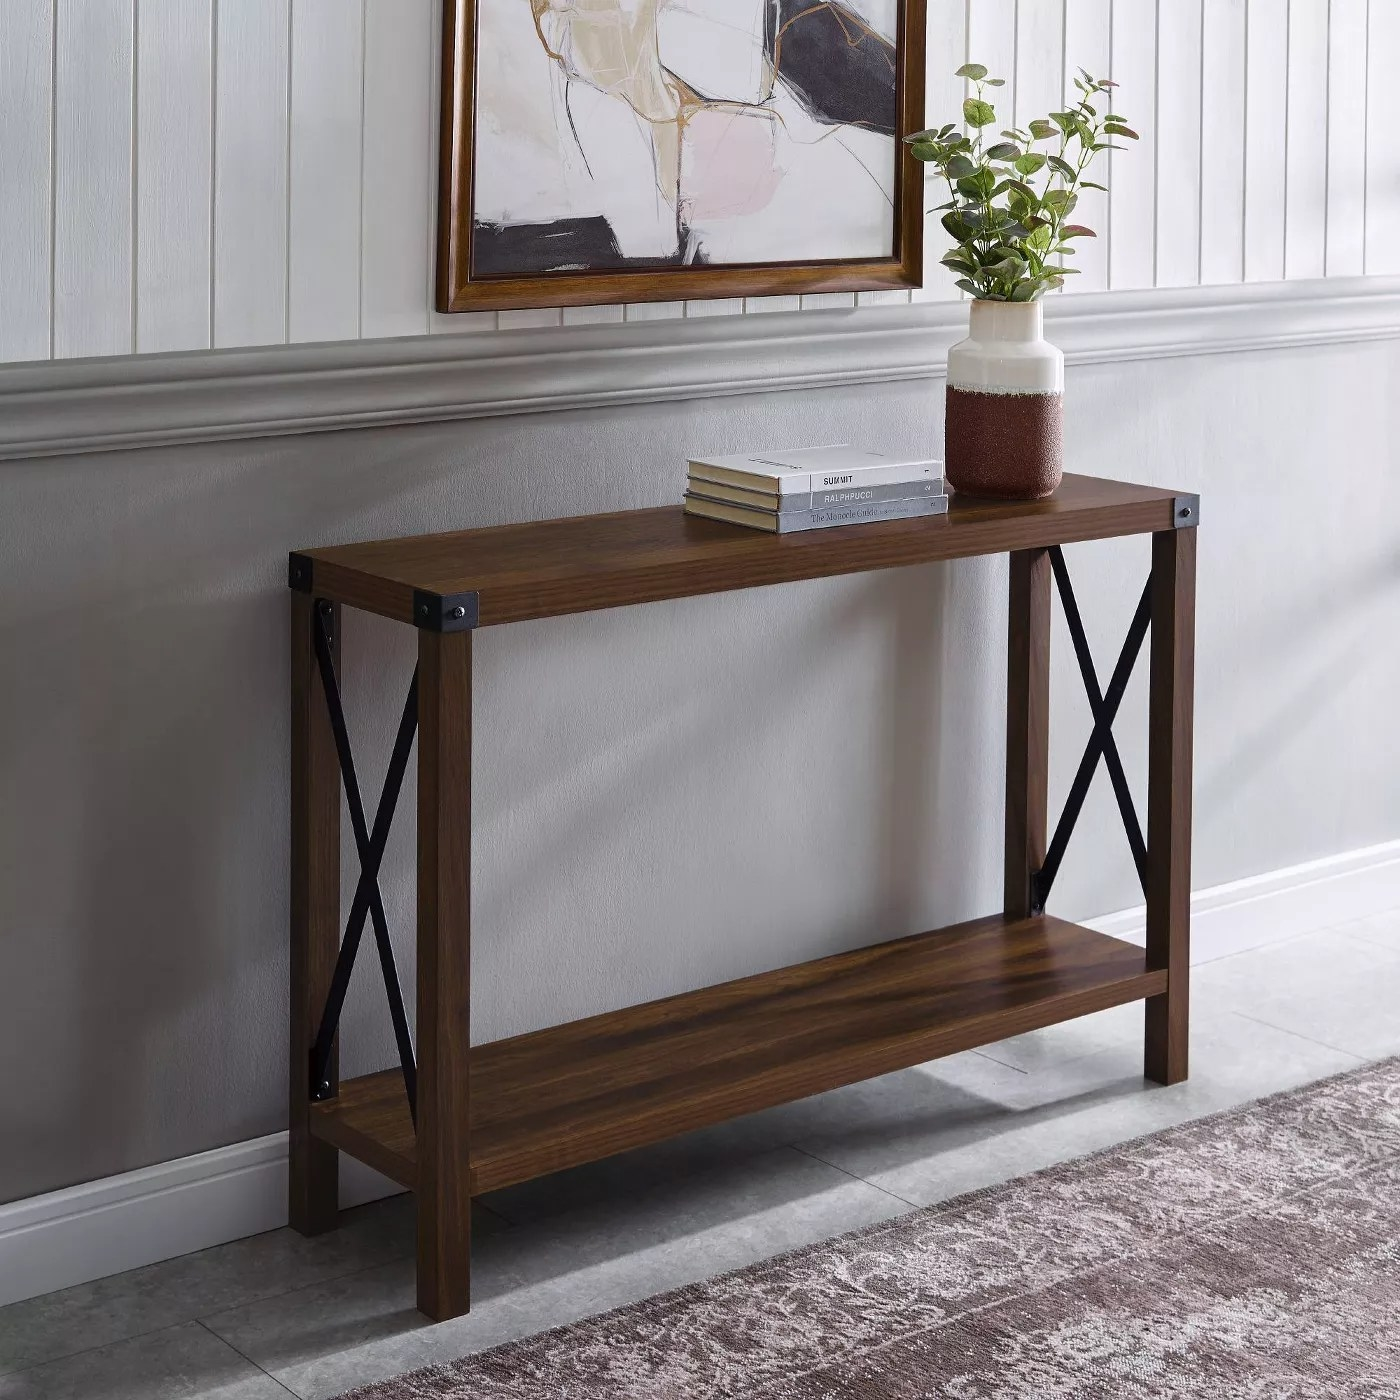 The metal-X entryway table in dark walnut